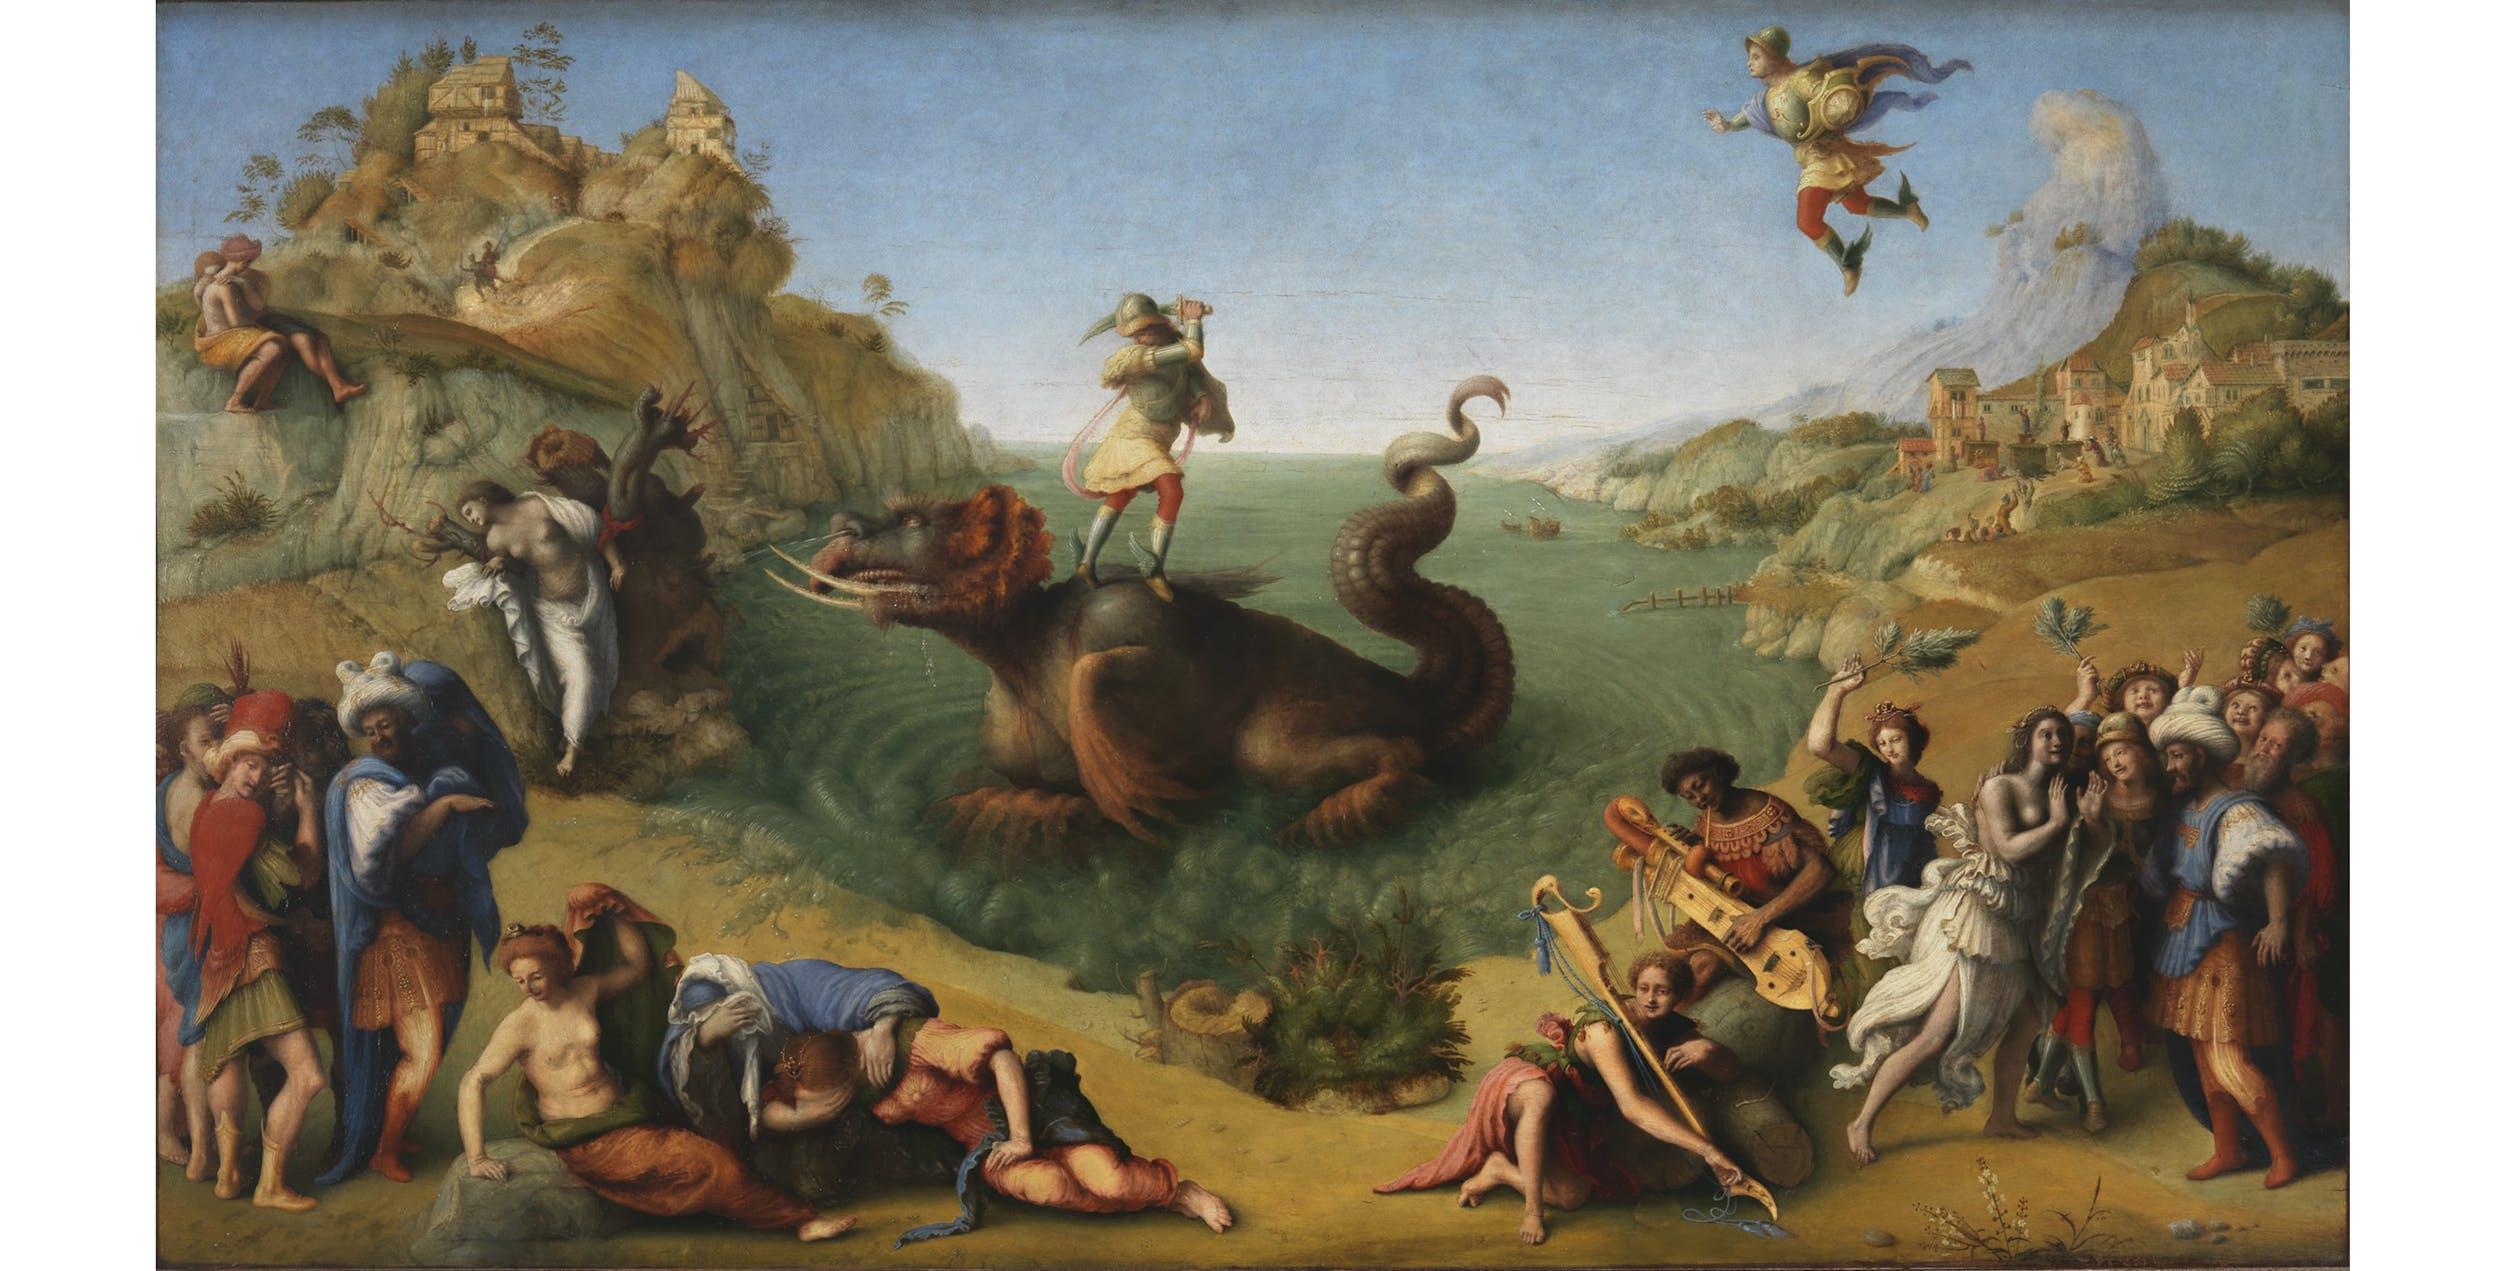 Piero di Cosimo, Perseo libera Andromeda I Piero di Cosimo, Perseo libera Andromeda